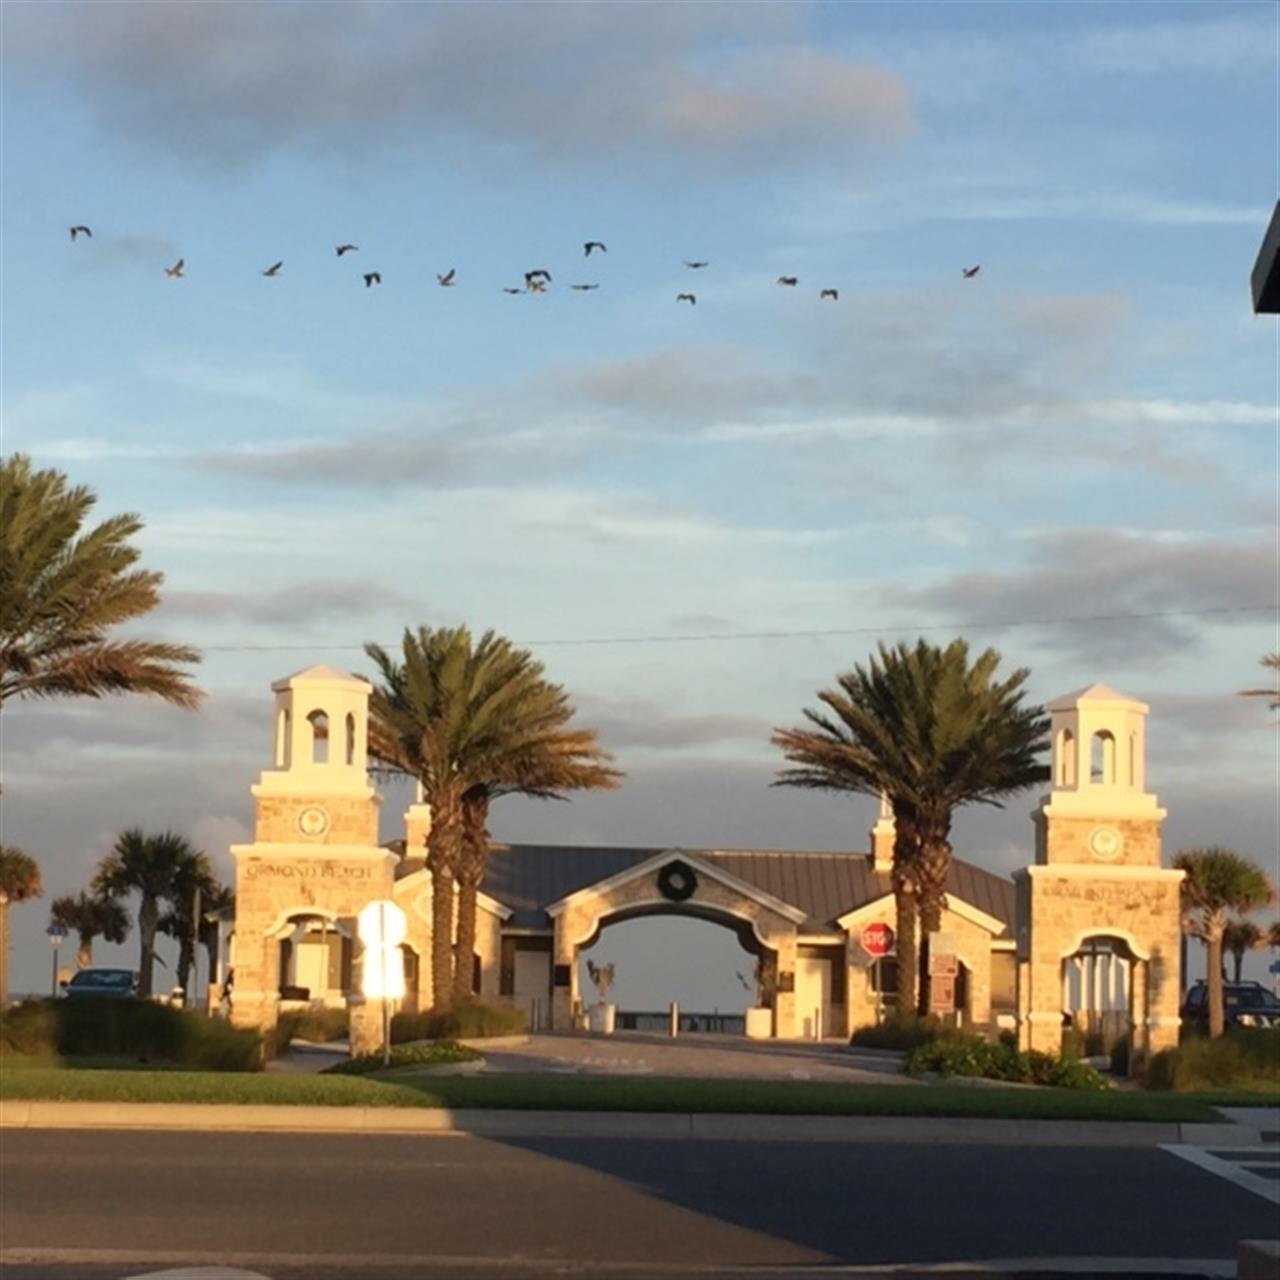 Andy Romano Park Ormond Beach, Florida